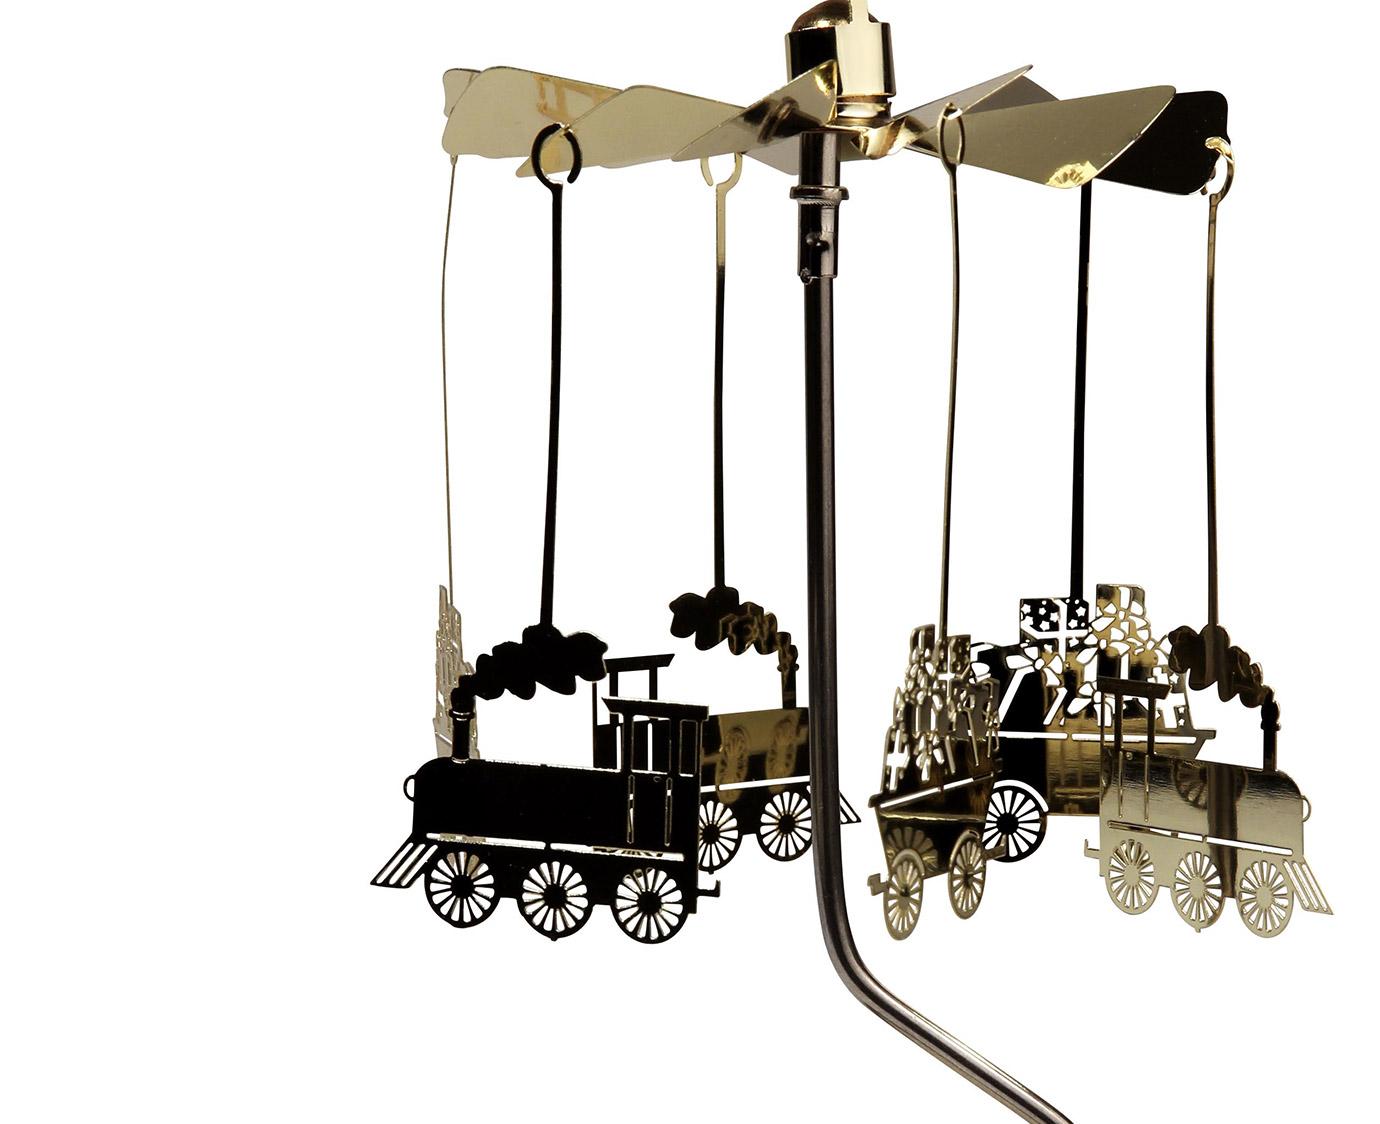 Carrousel 'Train'